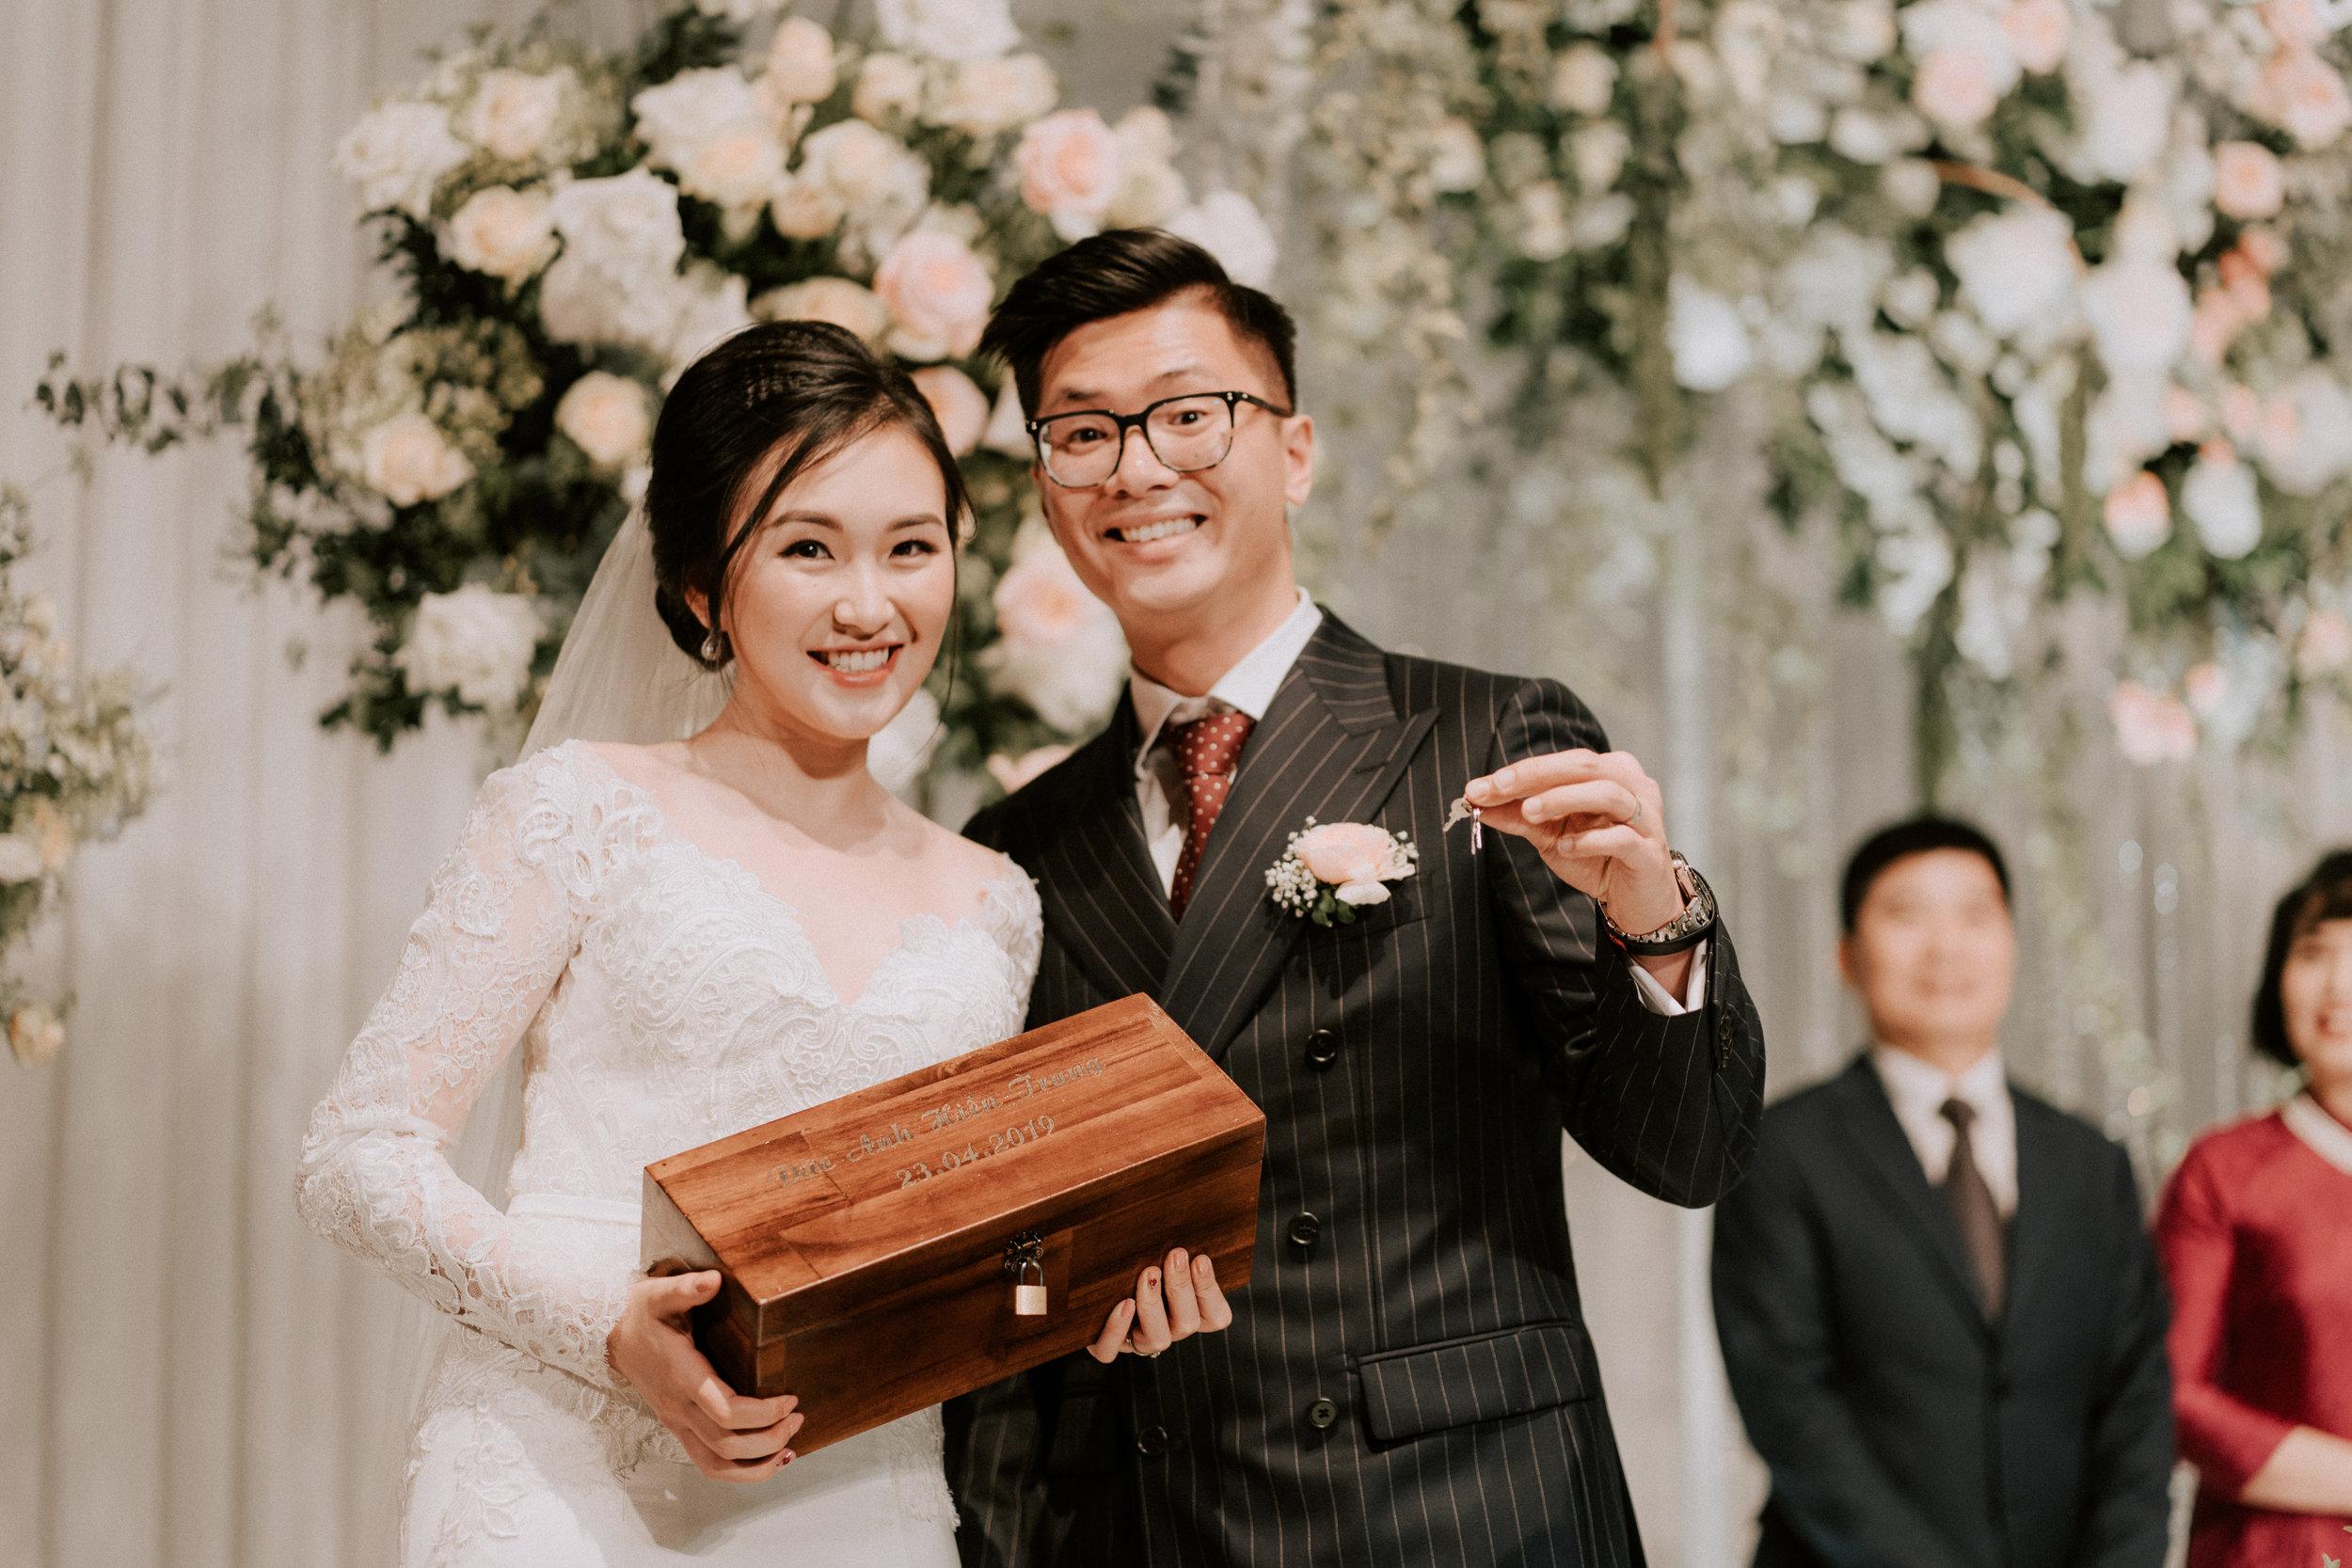 Mirrorwedding Destination Photographer TopofHanoi Duc Anh Hien Trang 182445.jpg